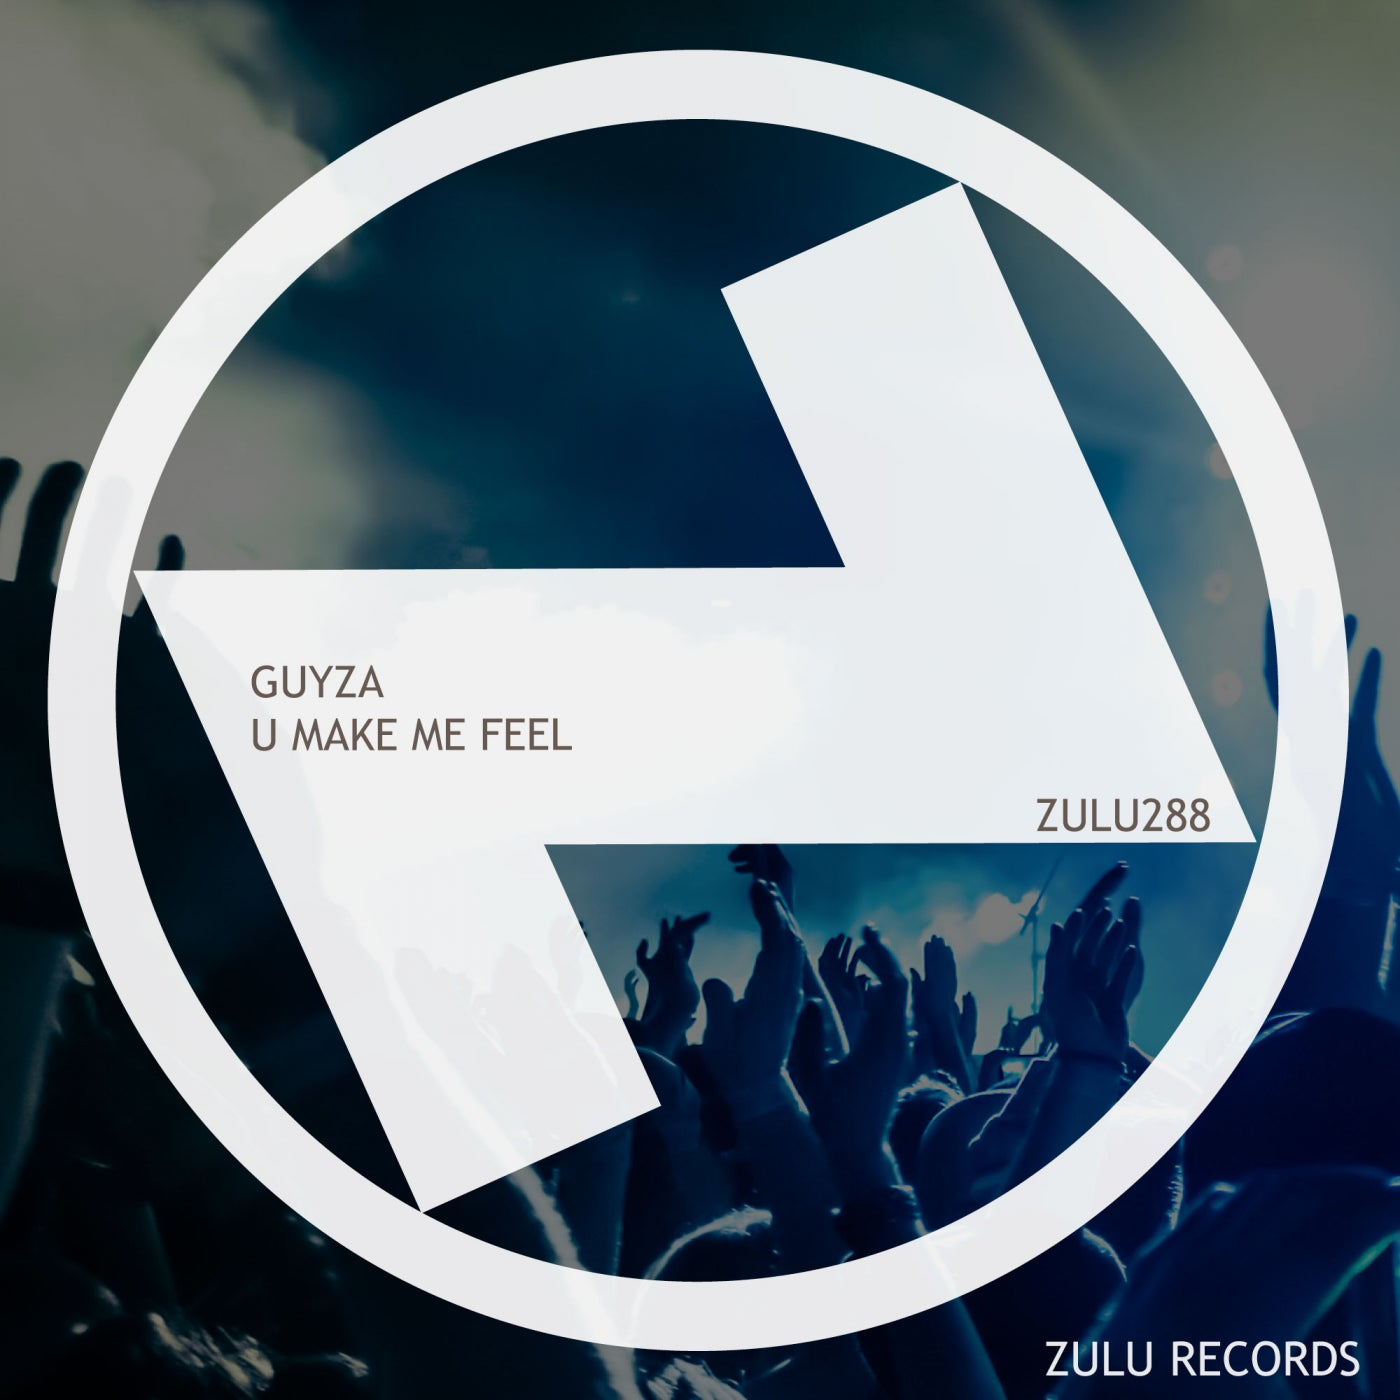 U Make Me Feel (Extended Mix)